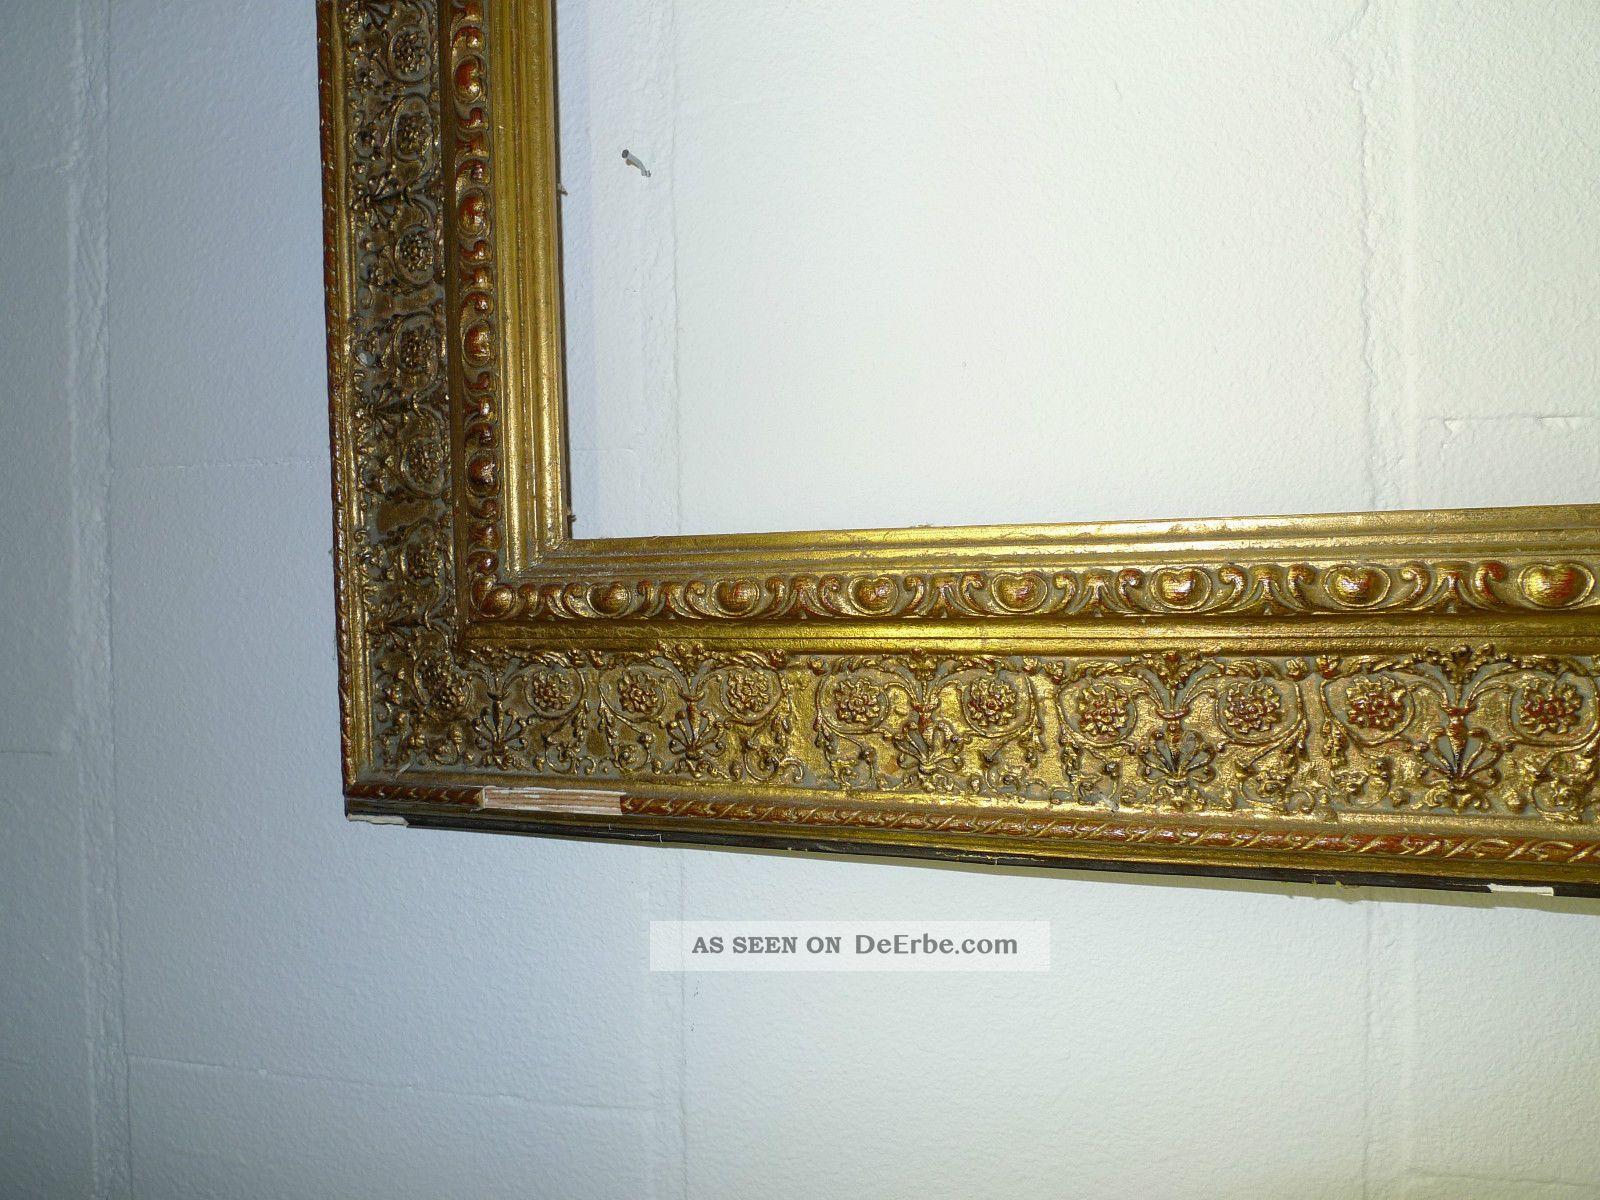 handarbeit gro er gebrauchter bilderrahmen gold antik sch n. Black Bedroom Furniture Sets. Home Design Ideas